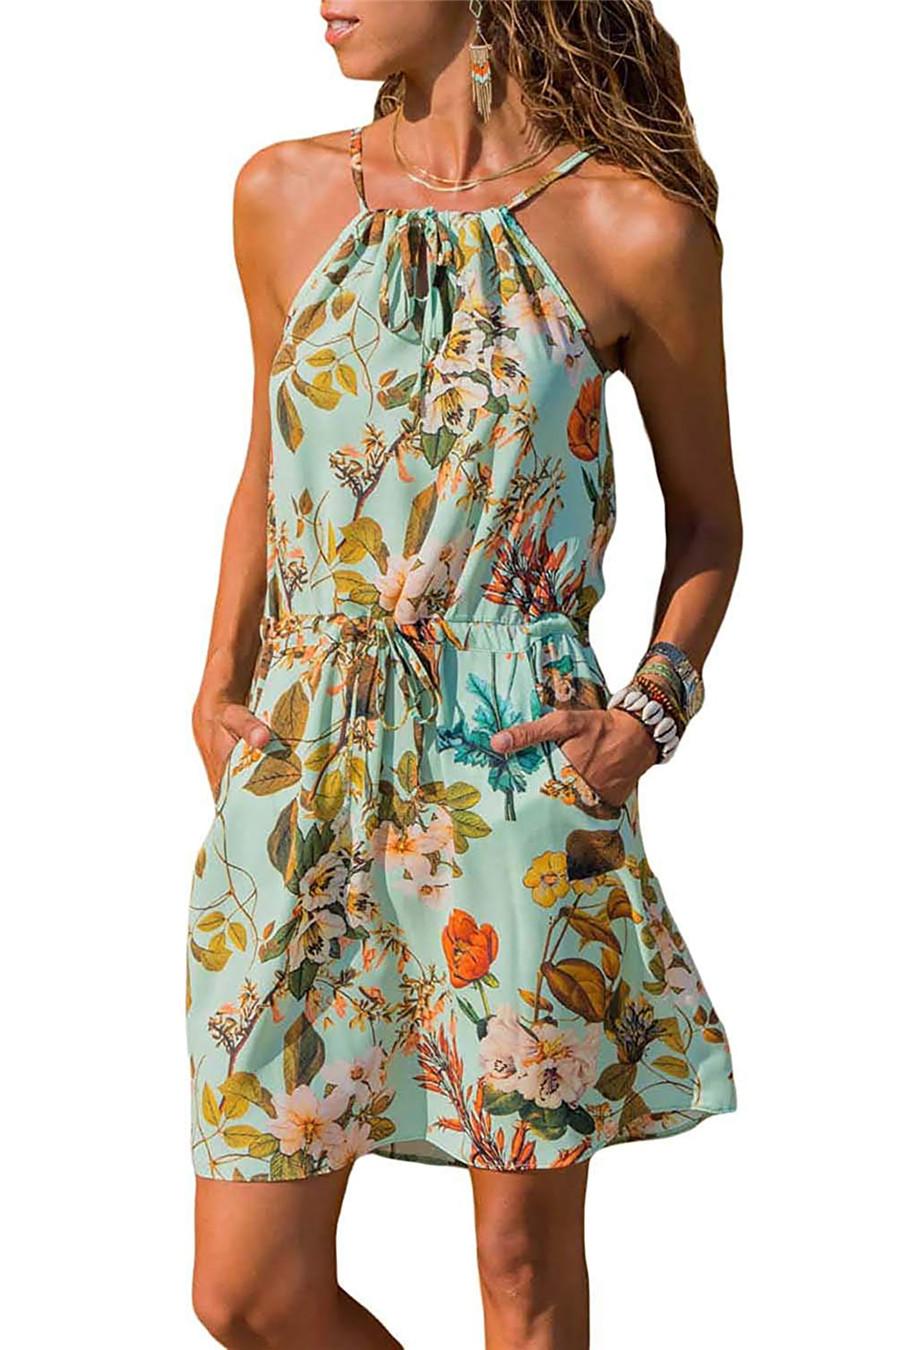 Gladiolus Chiffon Women Summer Dress Spaghetti Strap Floral Print Pocket Sexy Bohemian Beach Dress 2019 Short Ladies Dresses (39)